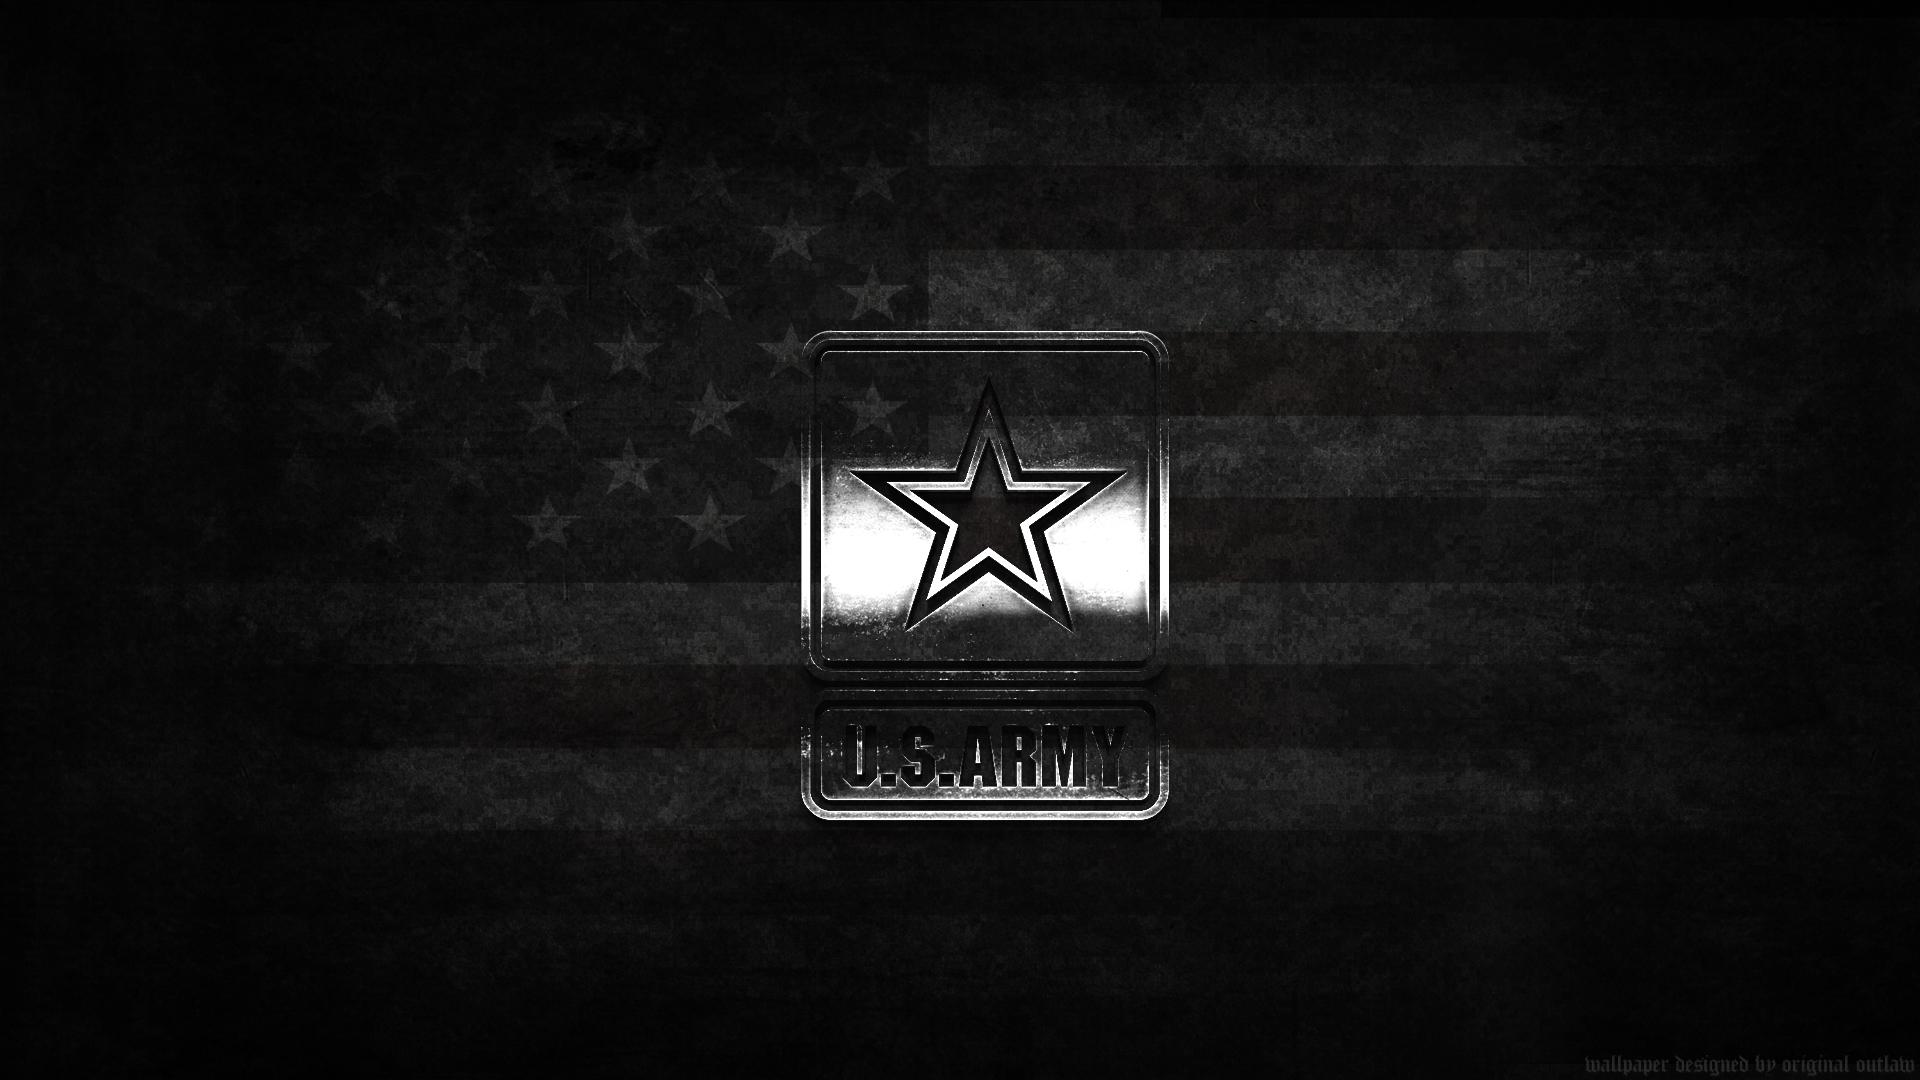 Army logo wallpaper 1920x1080 wallpapersafari - Army wallpaper hd 1080p ...